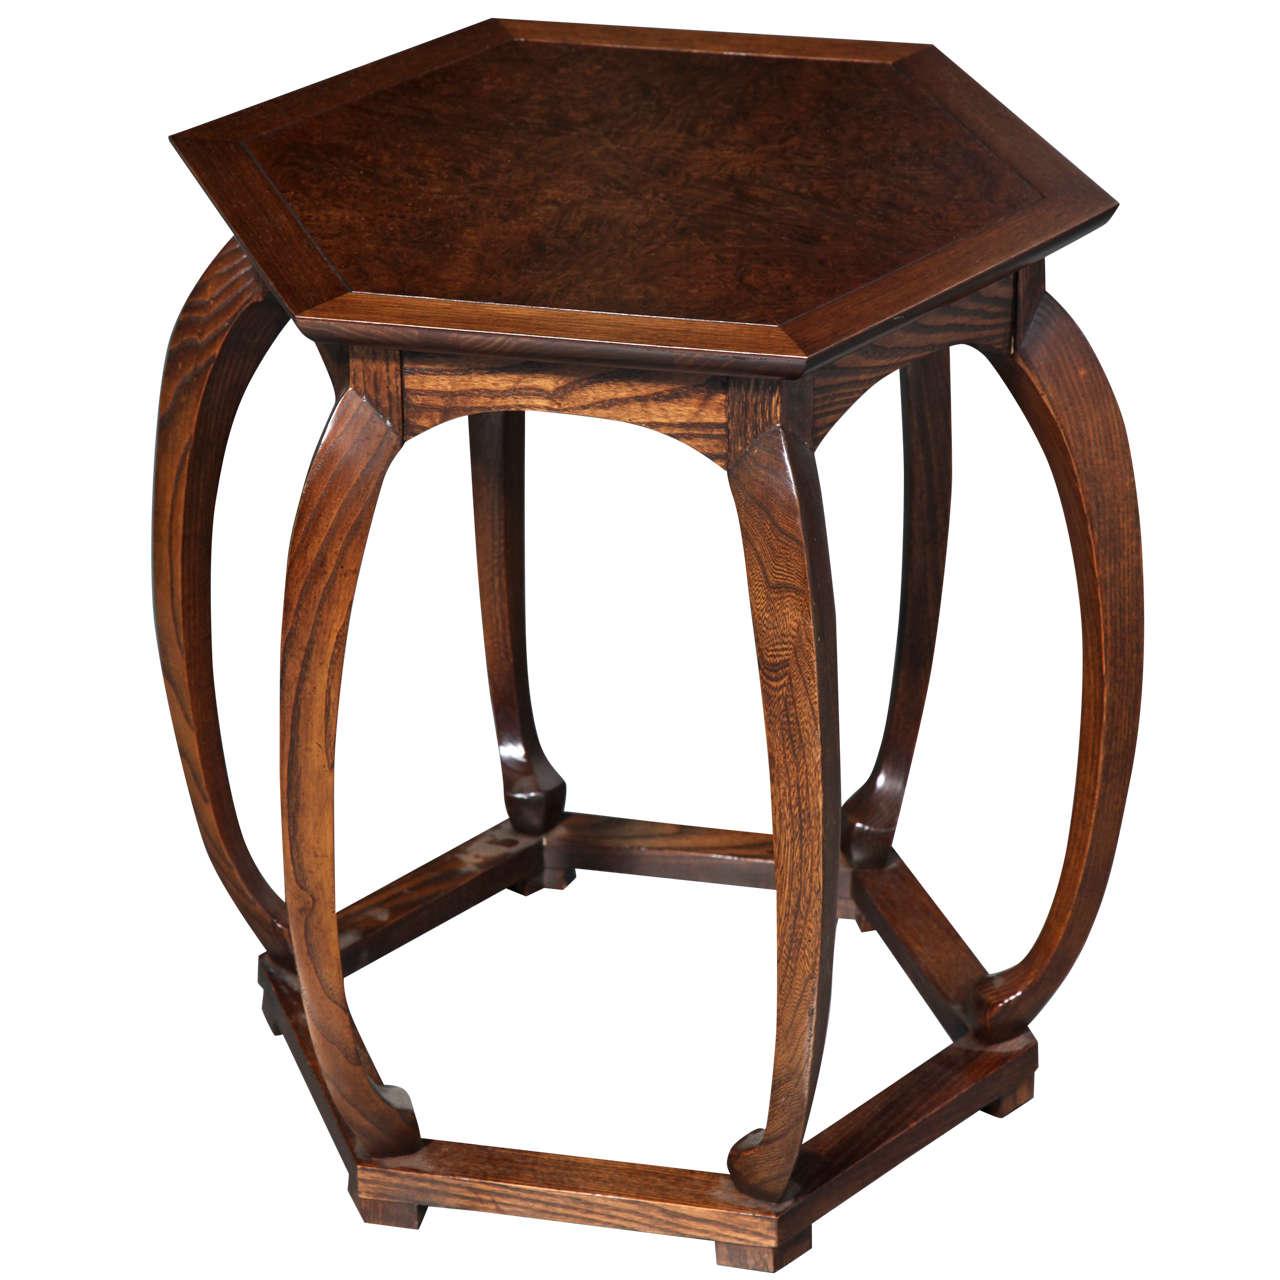 Baker furniture chinese style hexagonal table at 1stdibs for Baker furniture